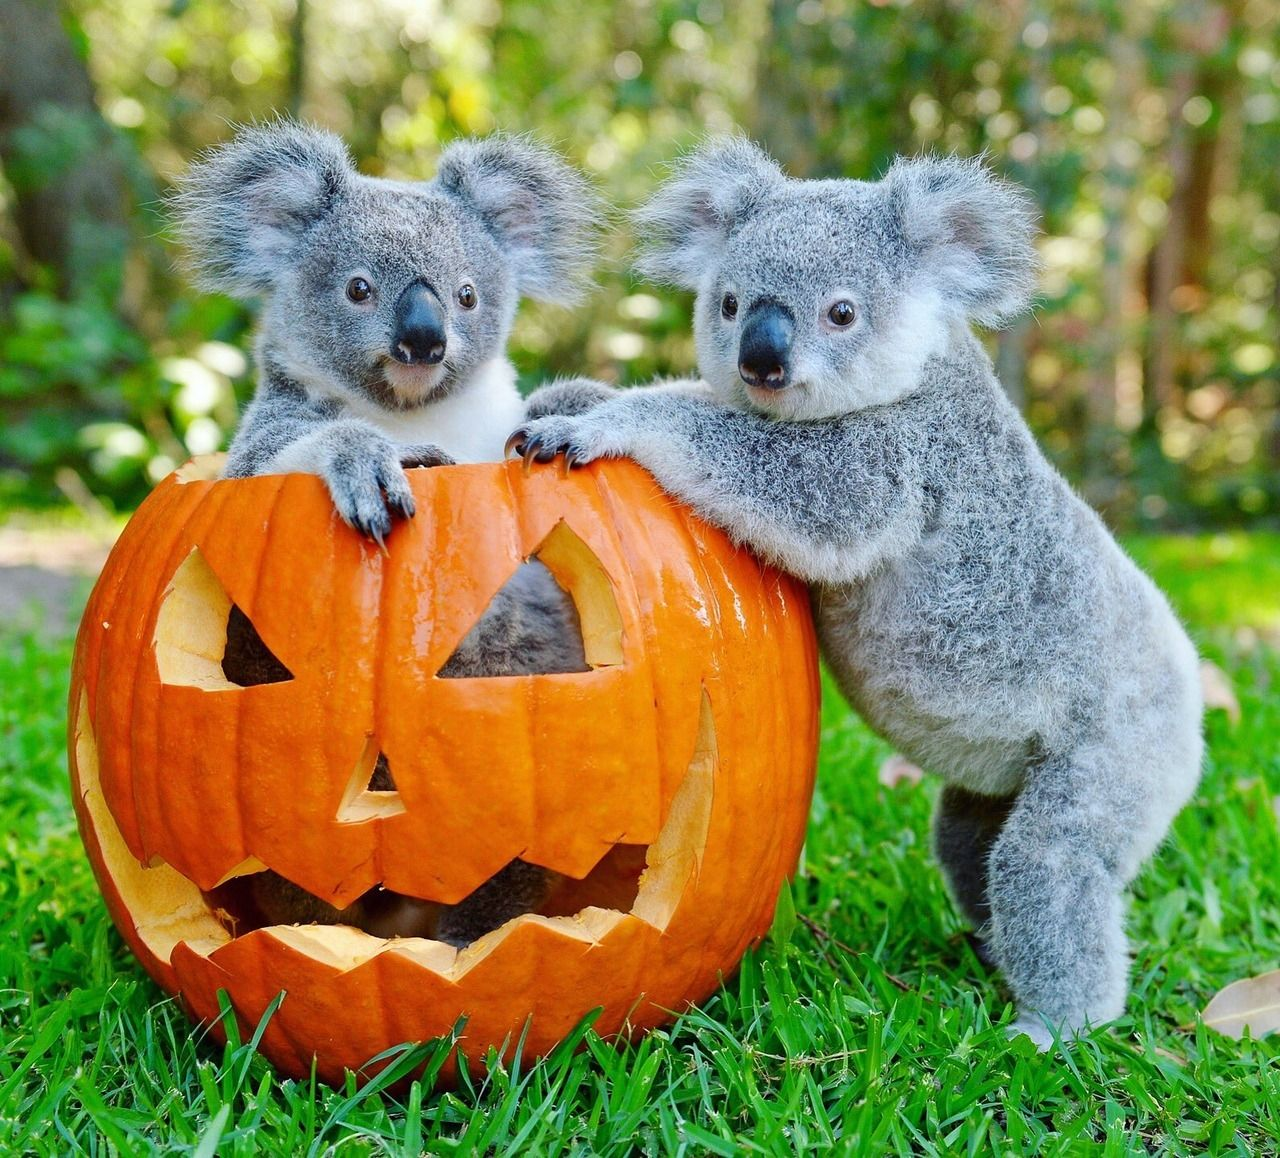 Pin by Trish Tinsley on koala Koala bear, Koala, Animals